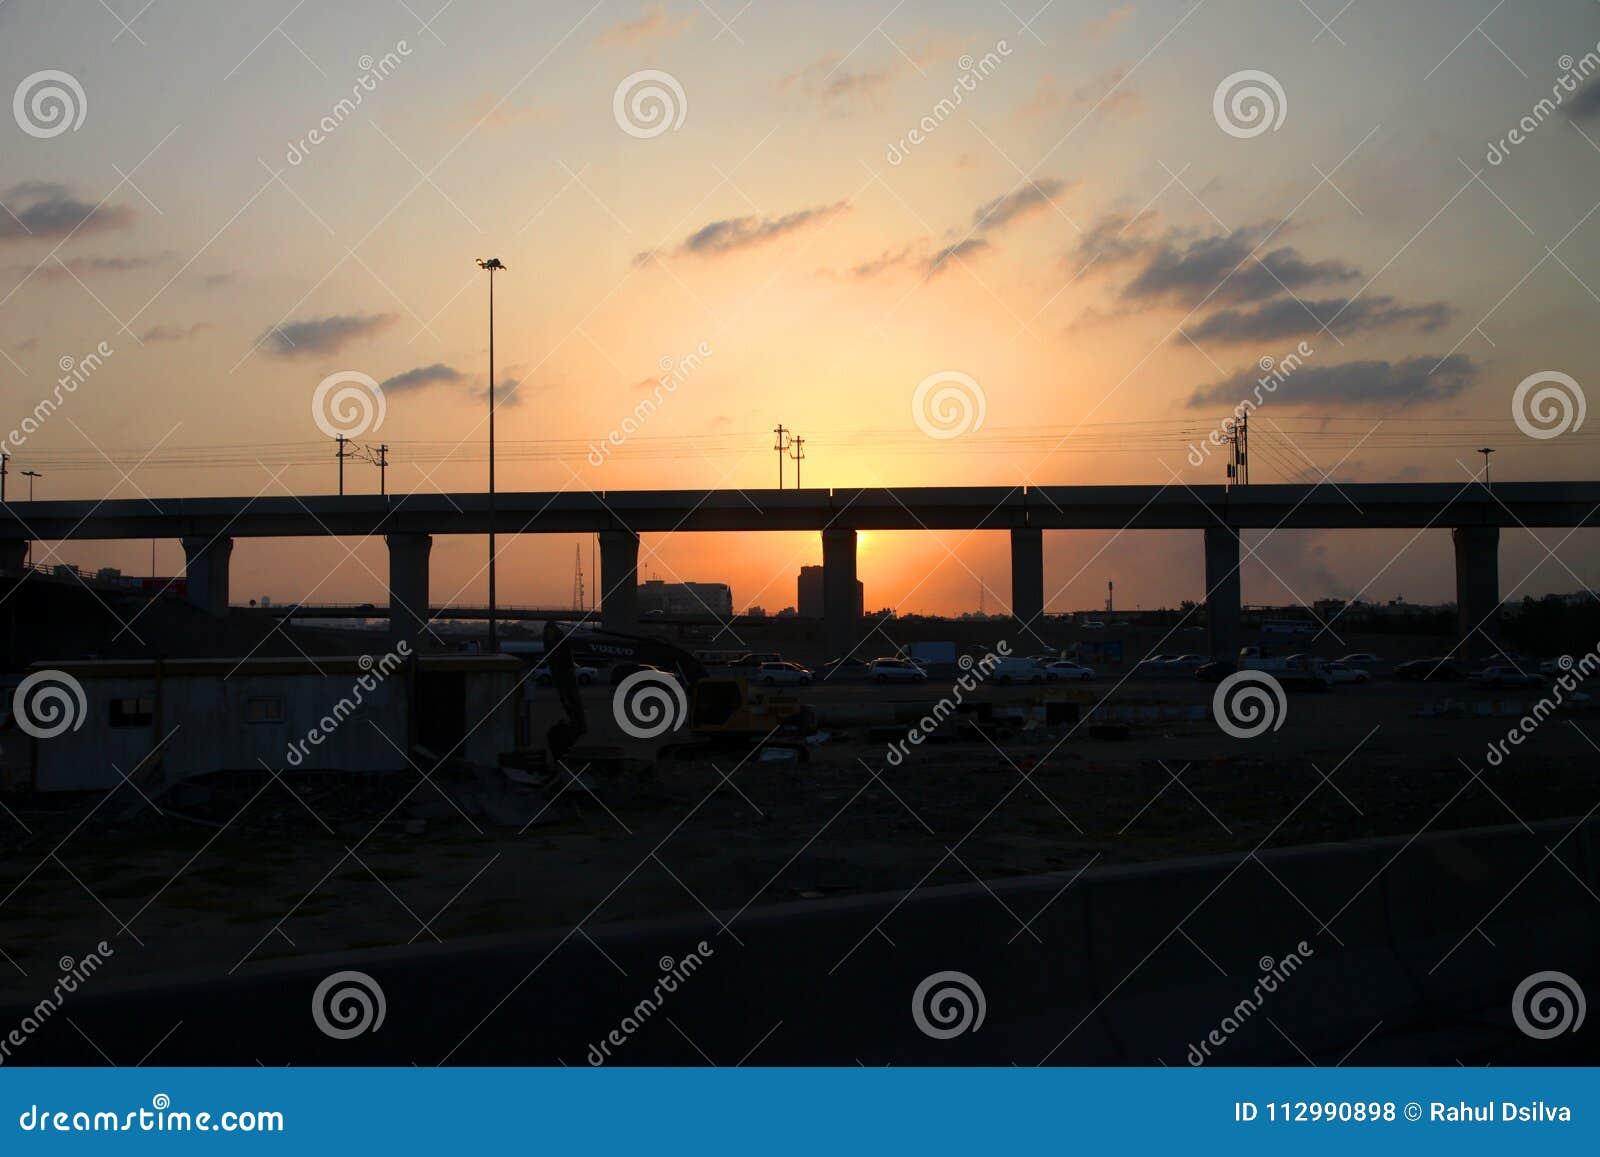 High speed railway jeddah in the sunset